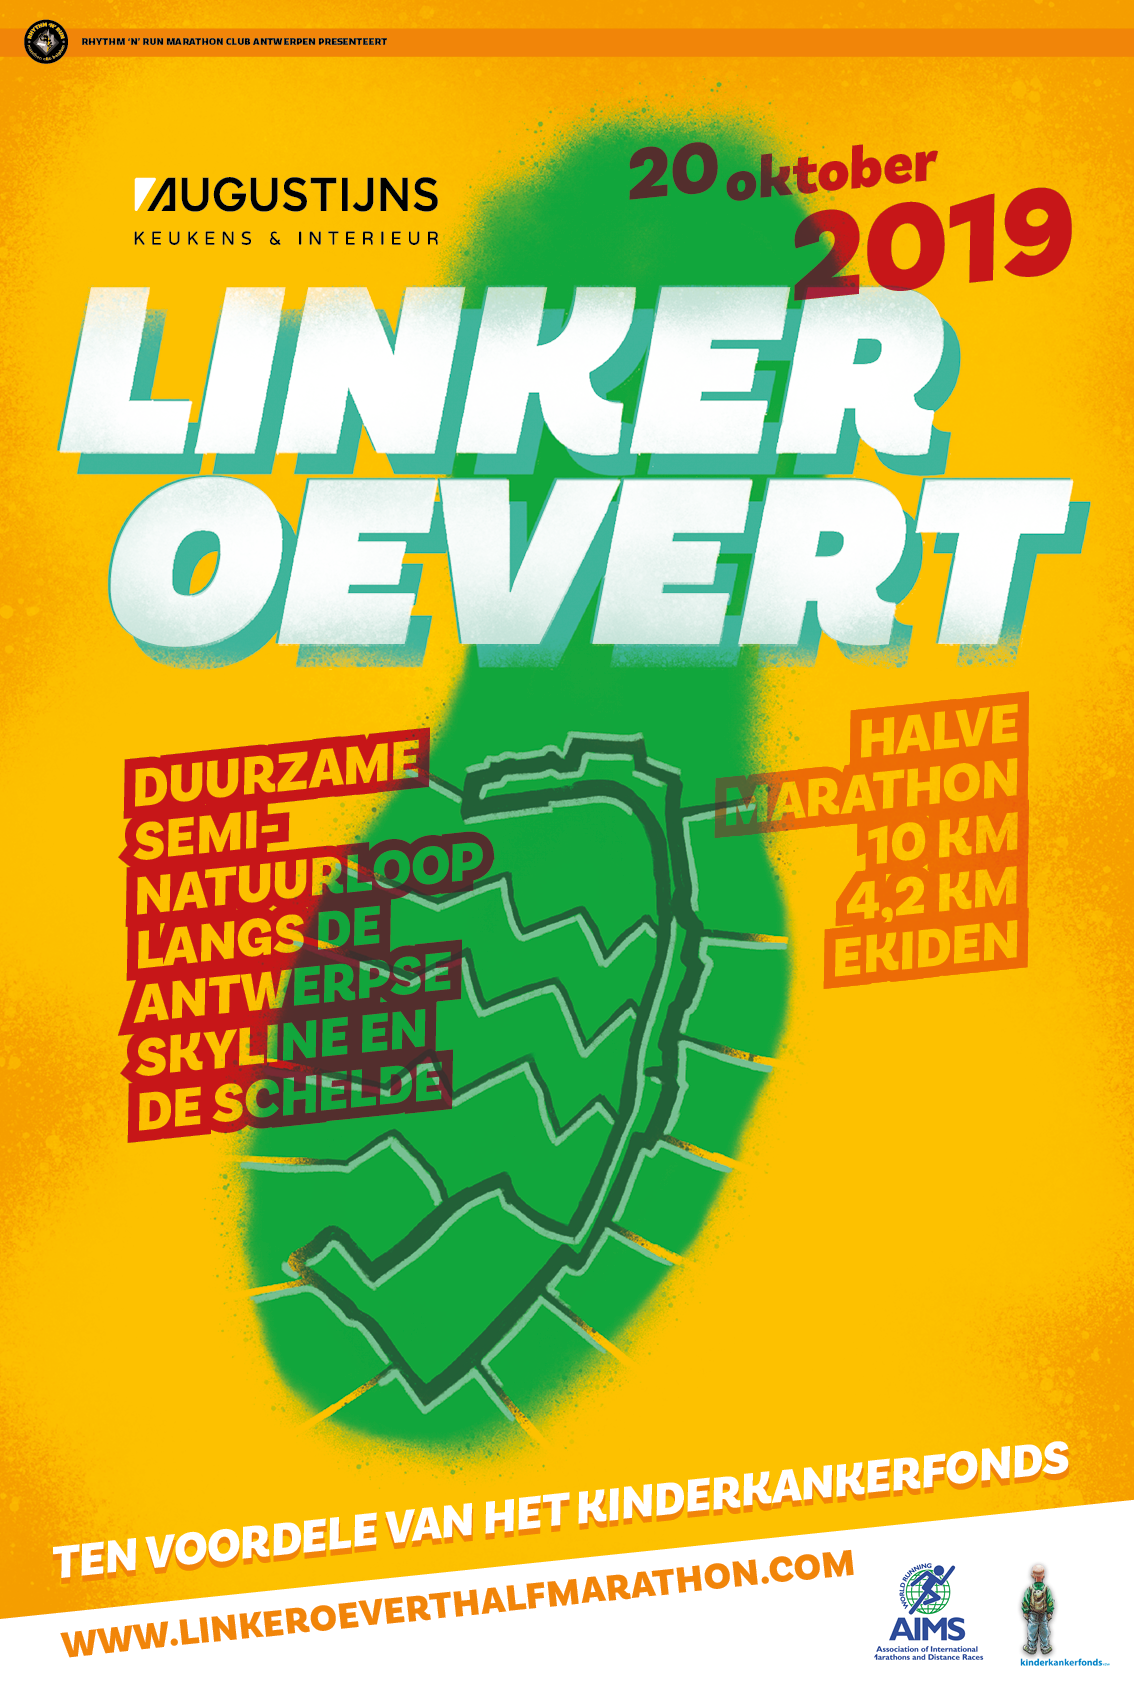 Linker Oevert Half Marathon 2019